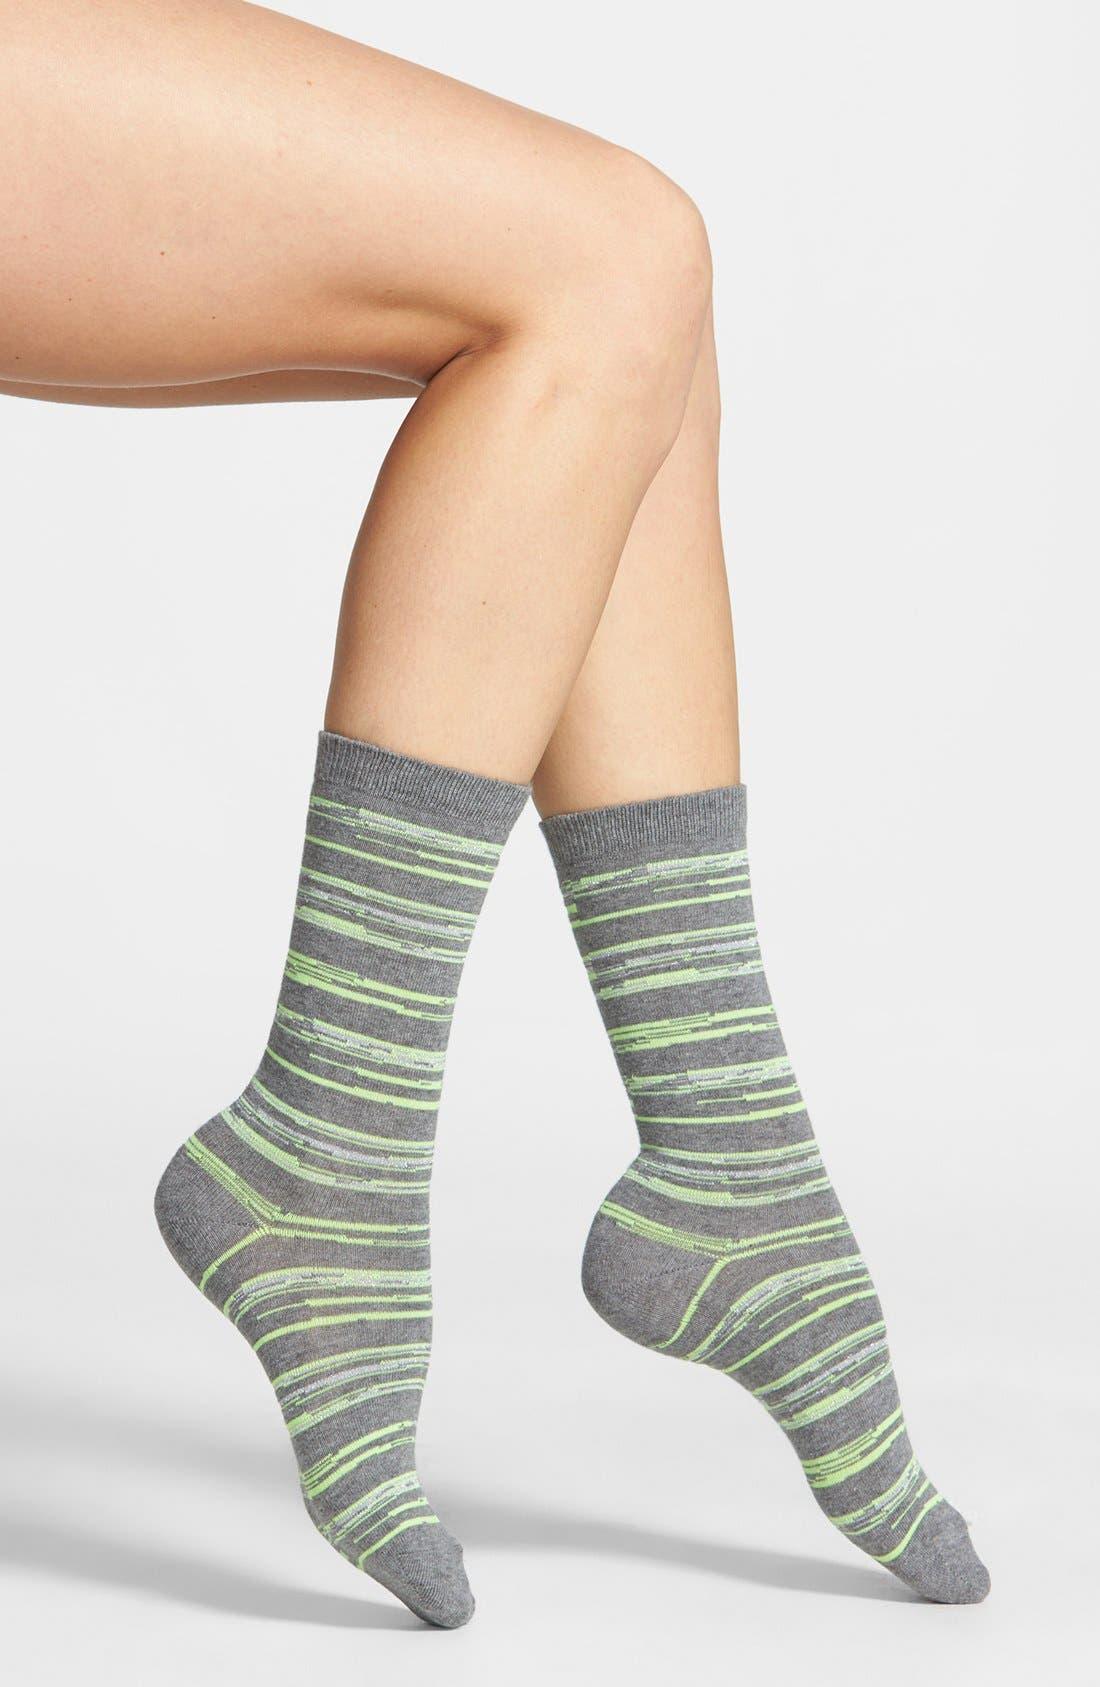 Alternate Image 1 Selected - Nordstrom Space Dye Crew Socks